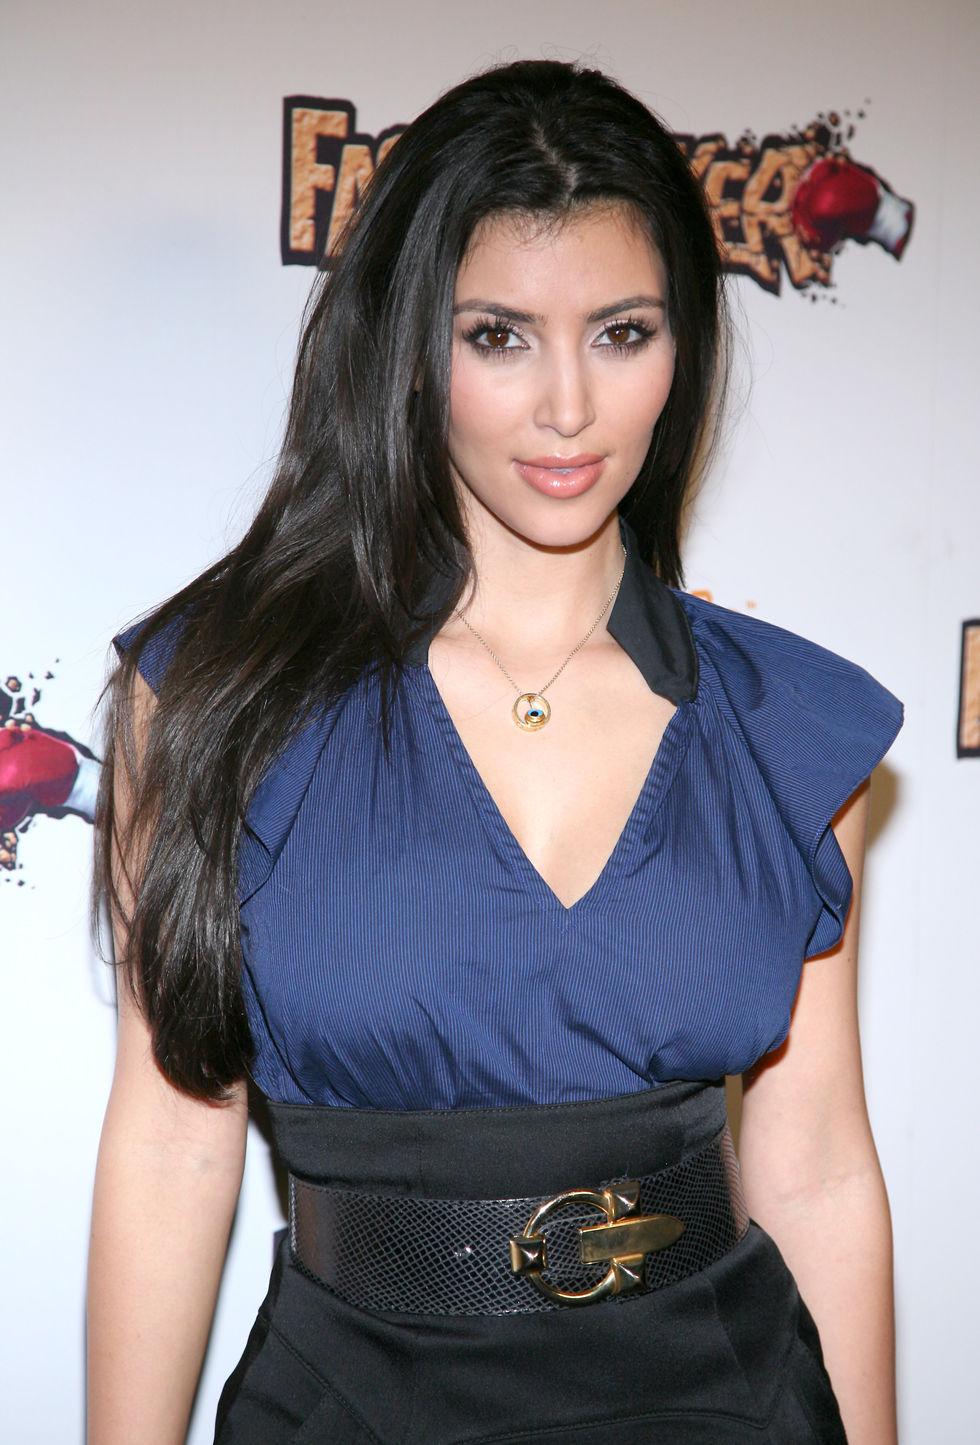 kim-kardashian-ea-sports-freestyle-launch-for-facebreaker-in-hollywood-01